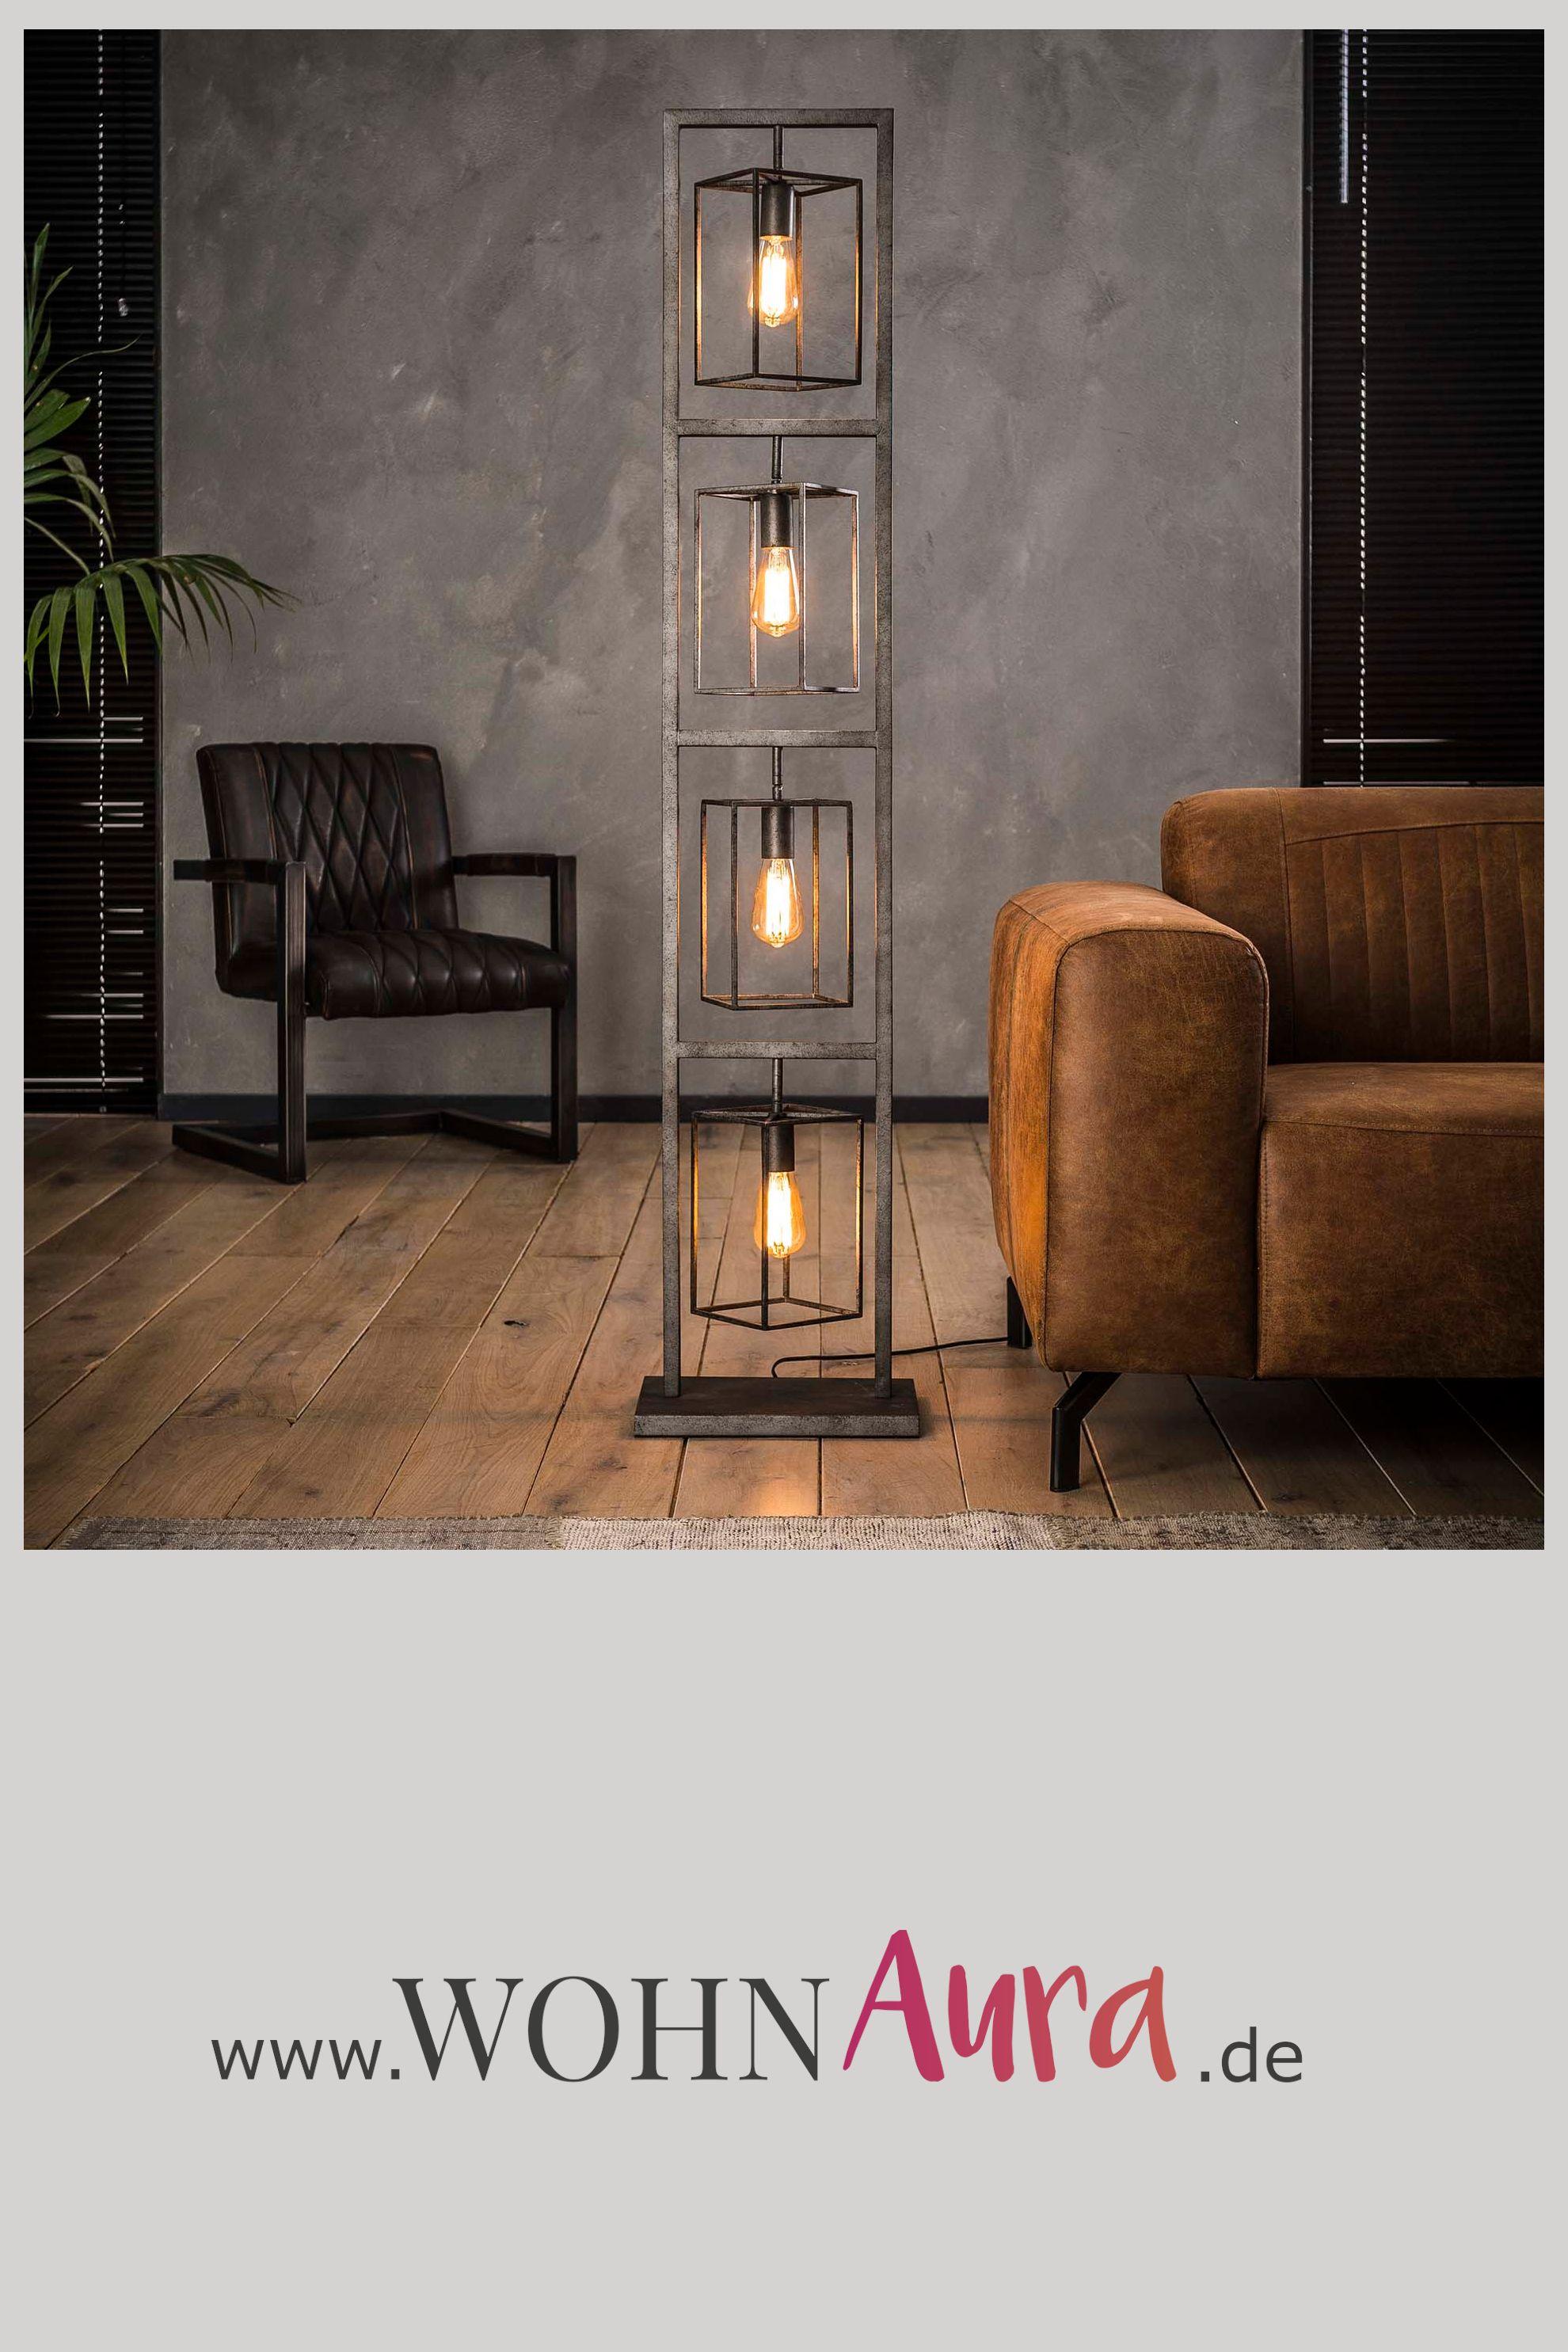 Stehlampe Kube Stehlampe Lampen Lampenschirm